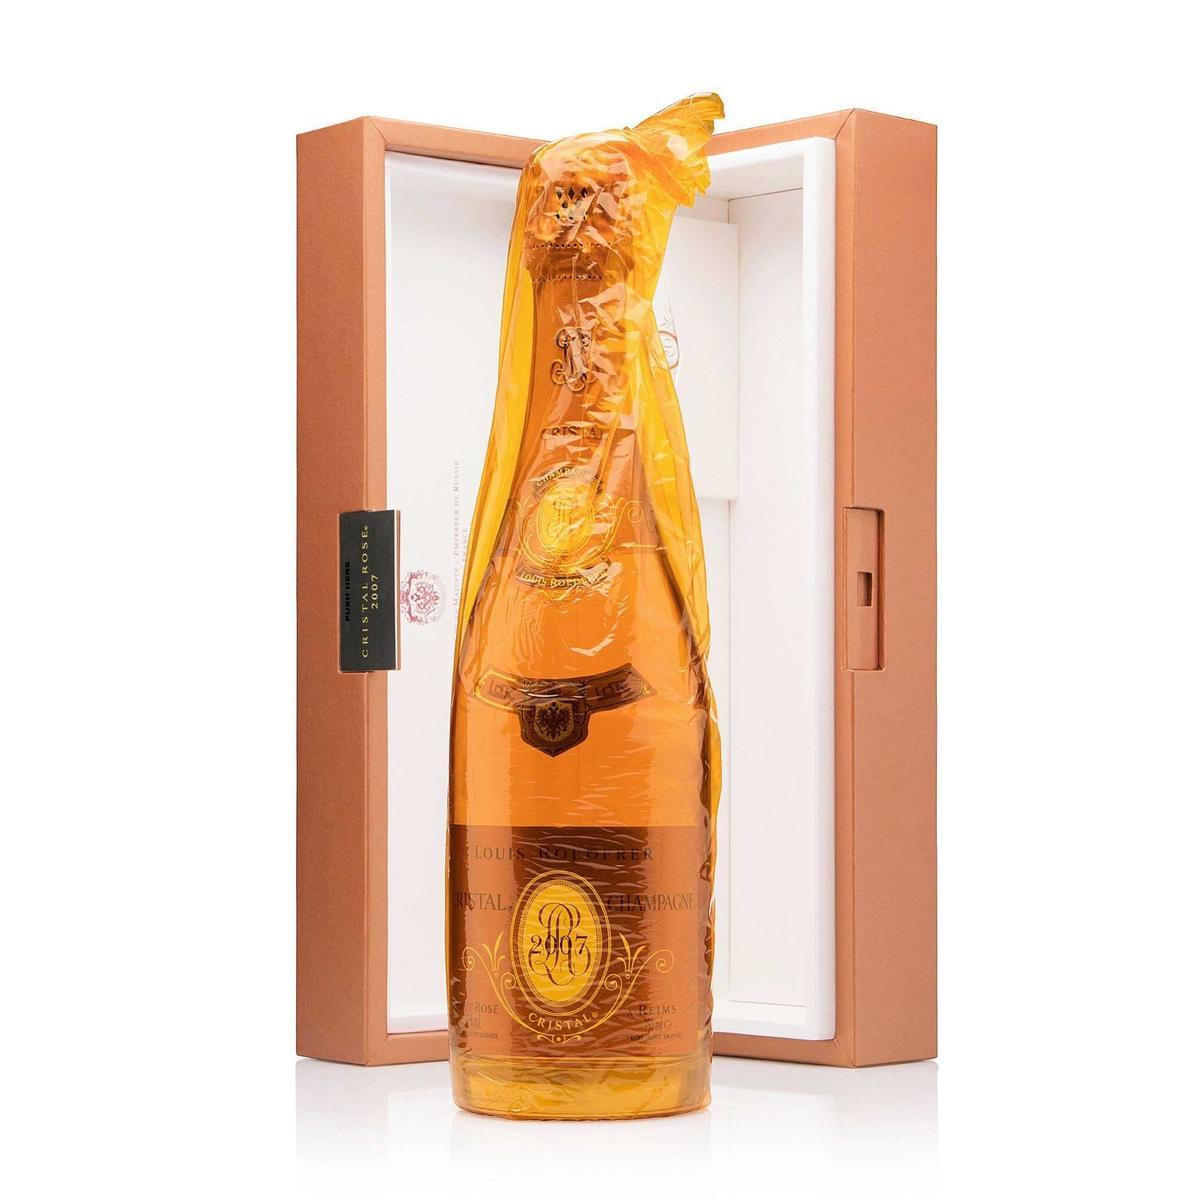 Champagne Cristal Brut Rosé Louis Roederer com estojo individual  2007/2008 750ml